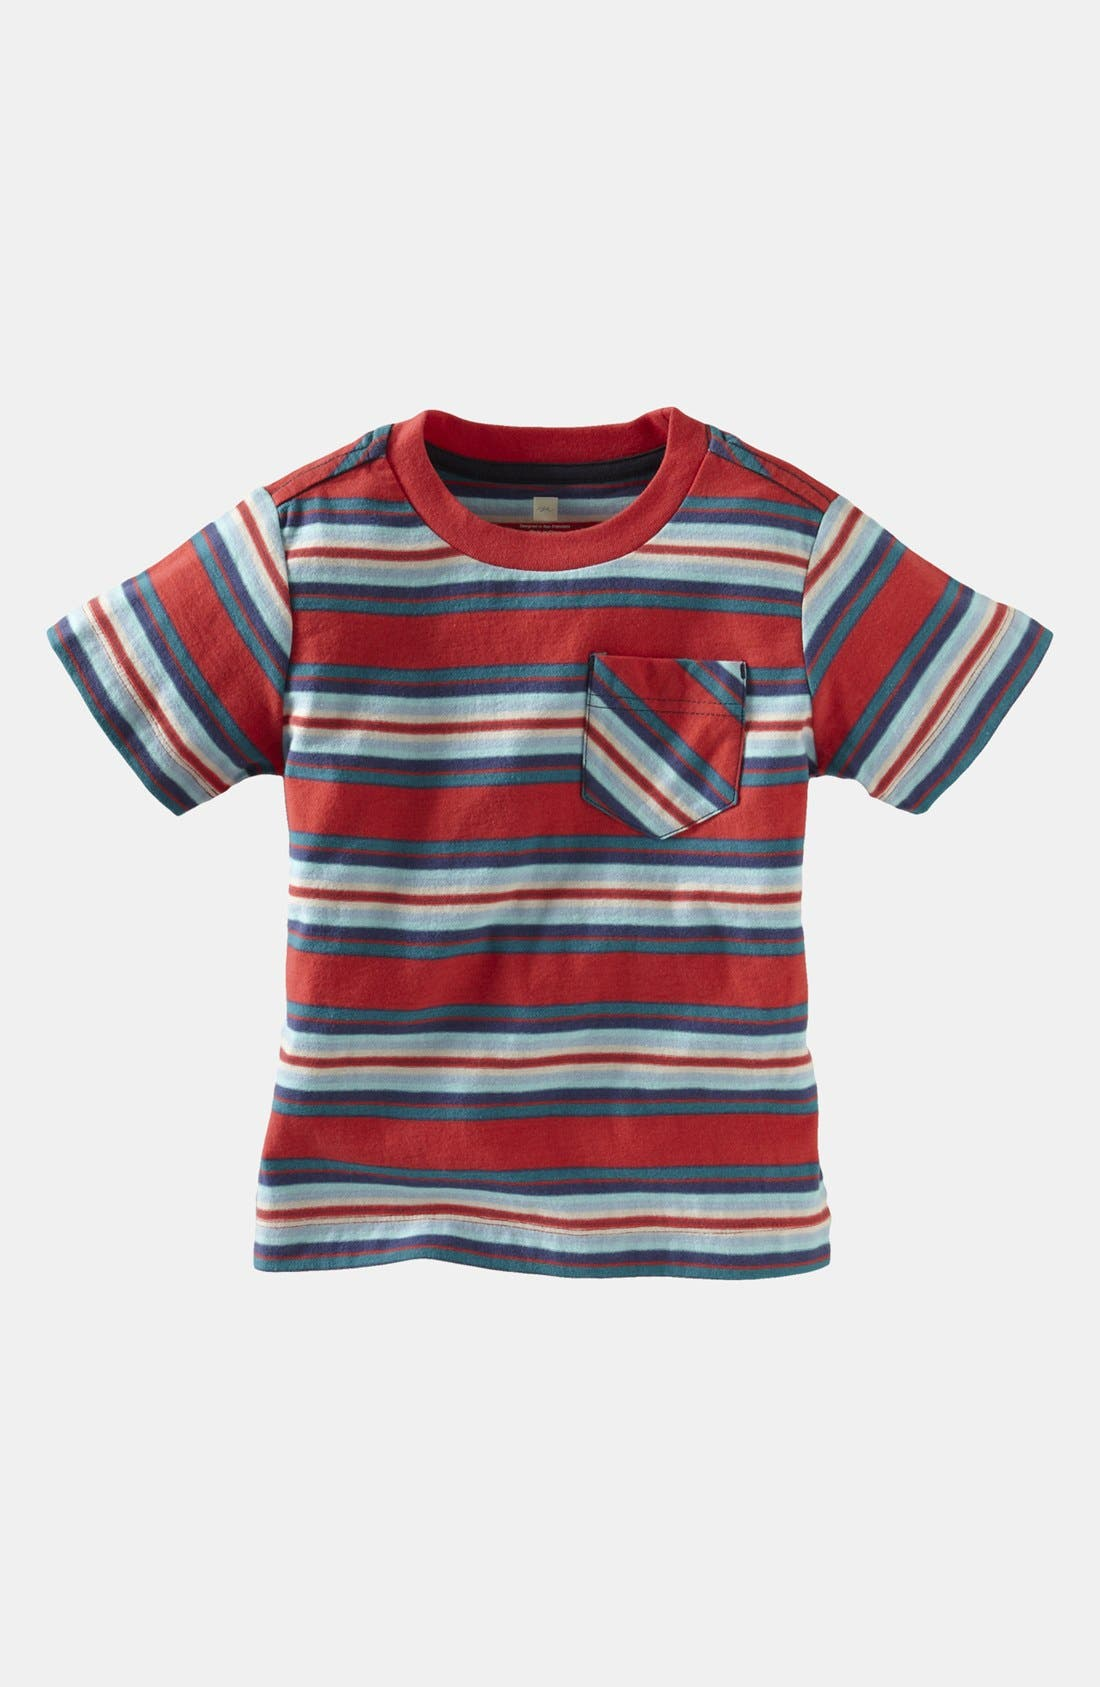 Main Image - Tea Collection 'Venda' Stripe T-Shirt (Toddler)